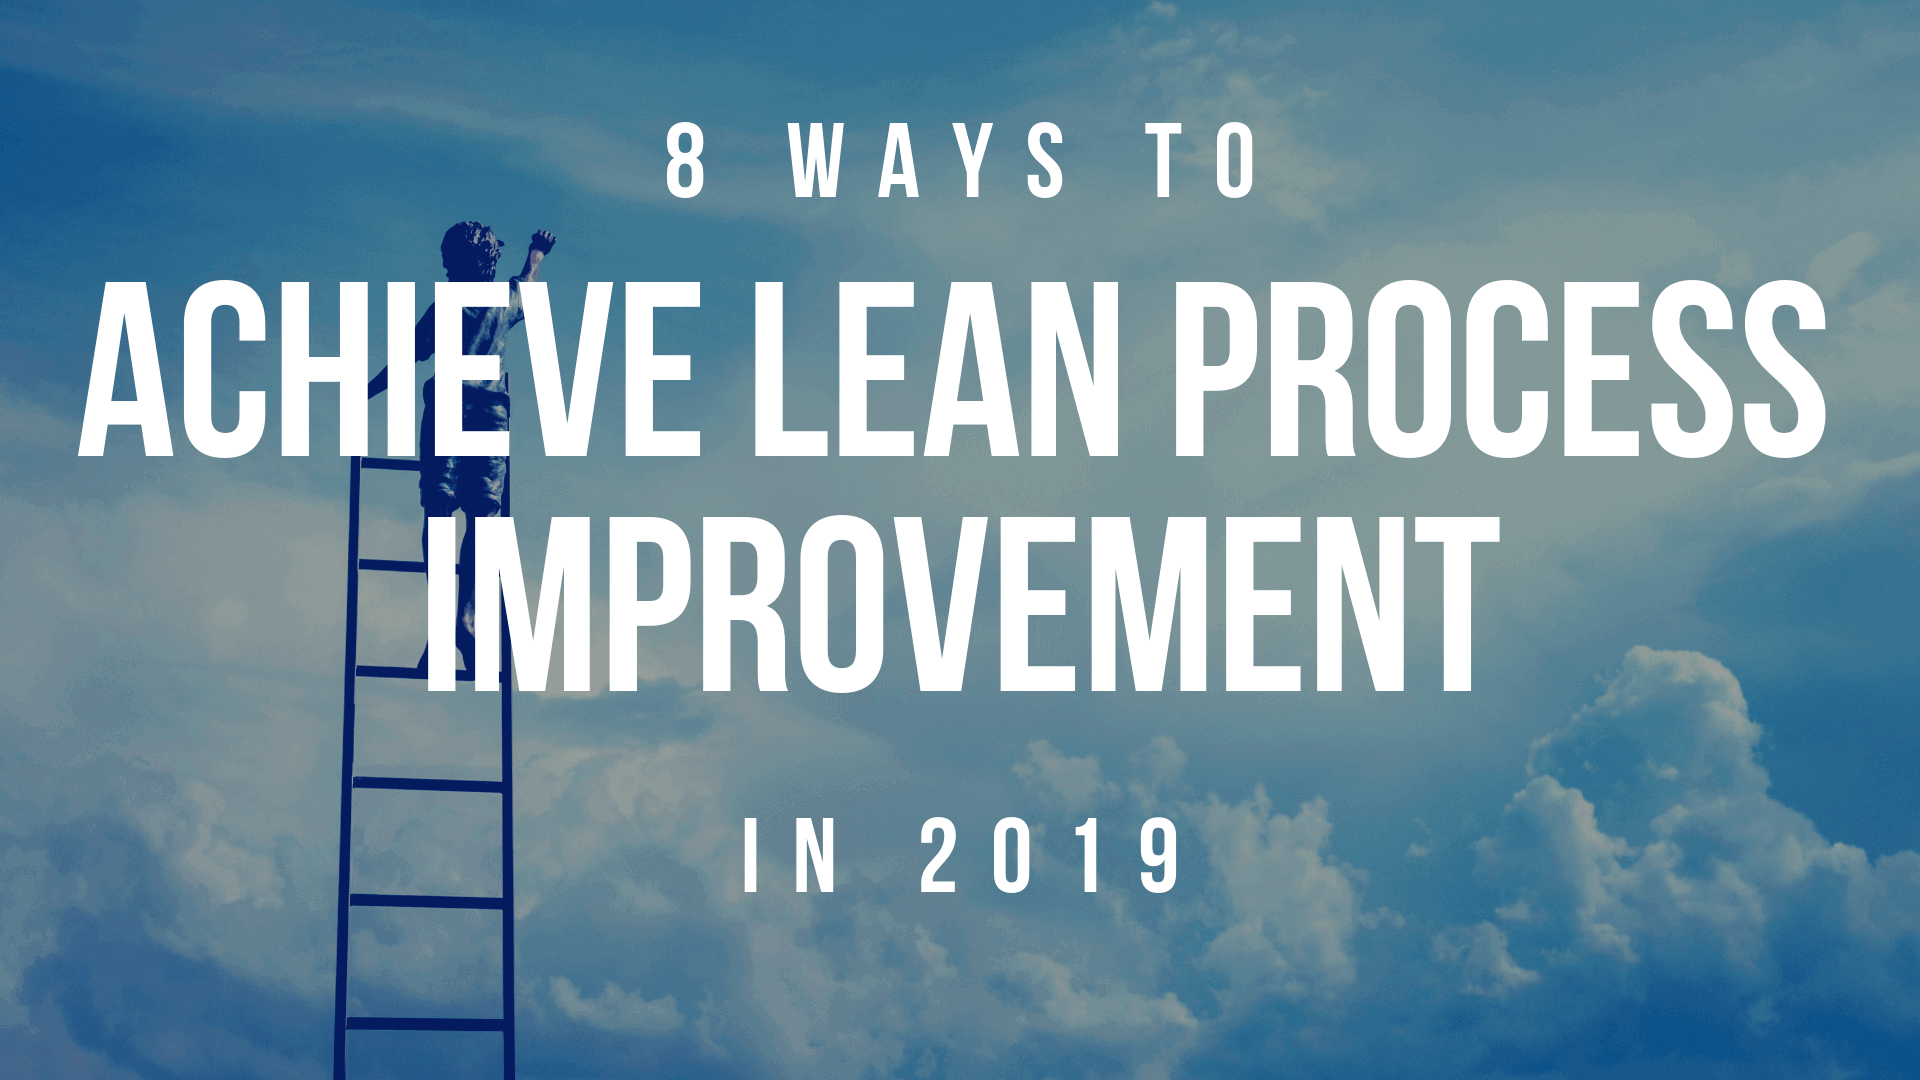 8 Ways to Achieve Lean Process Improvement